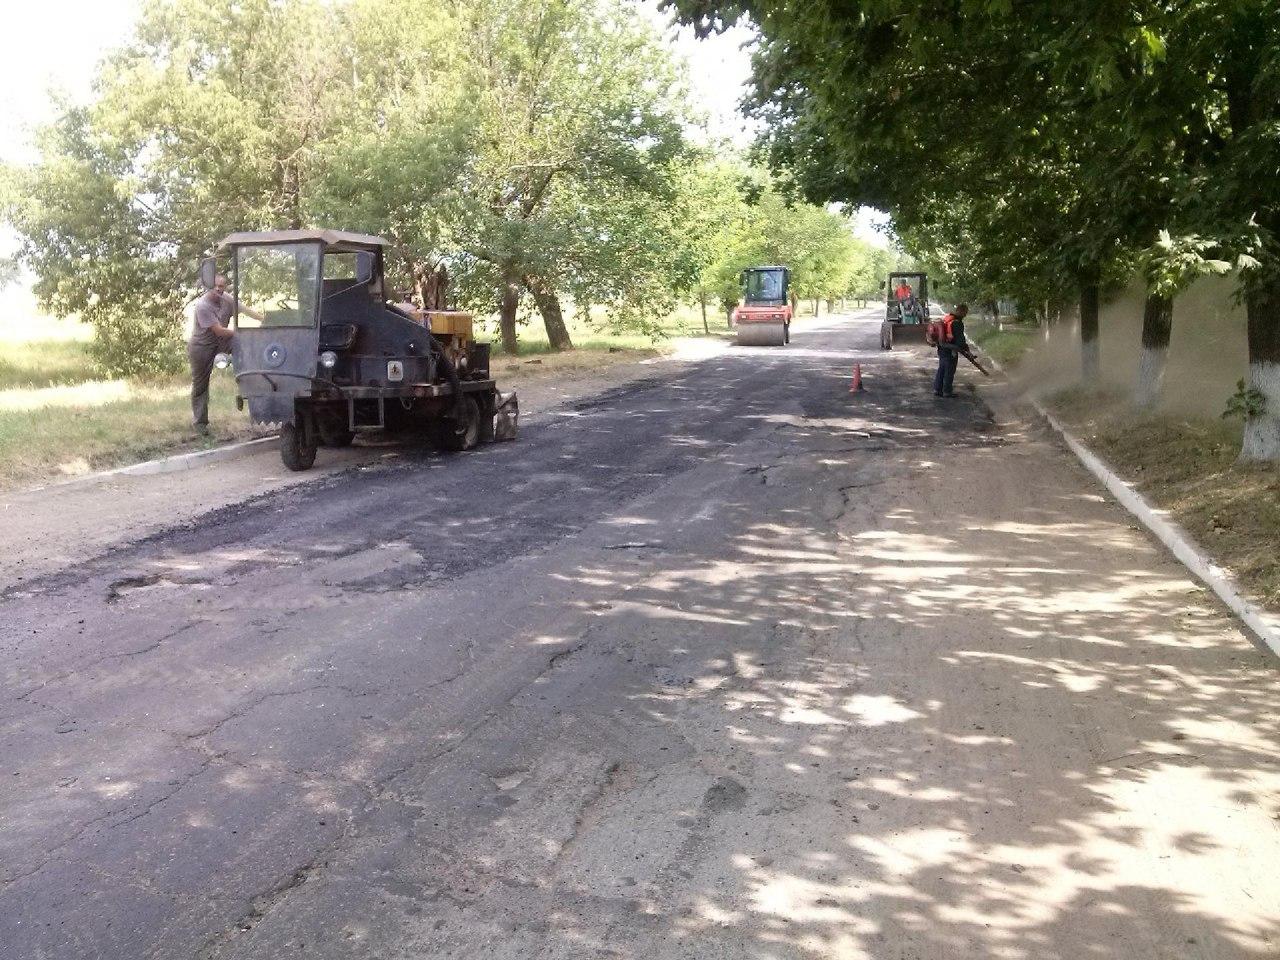 RLBjdwNC7e8 В Сергеевке под конец курортного сезона ремонтируют дороги (фото)